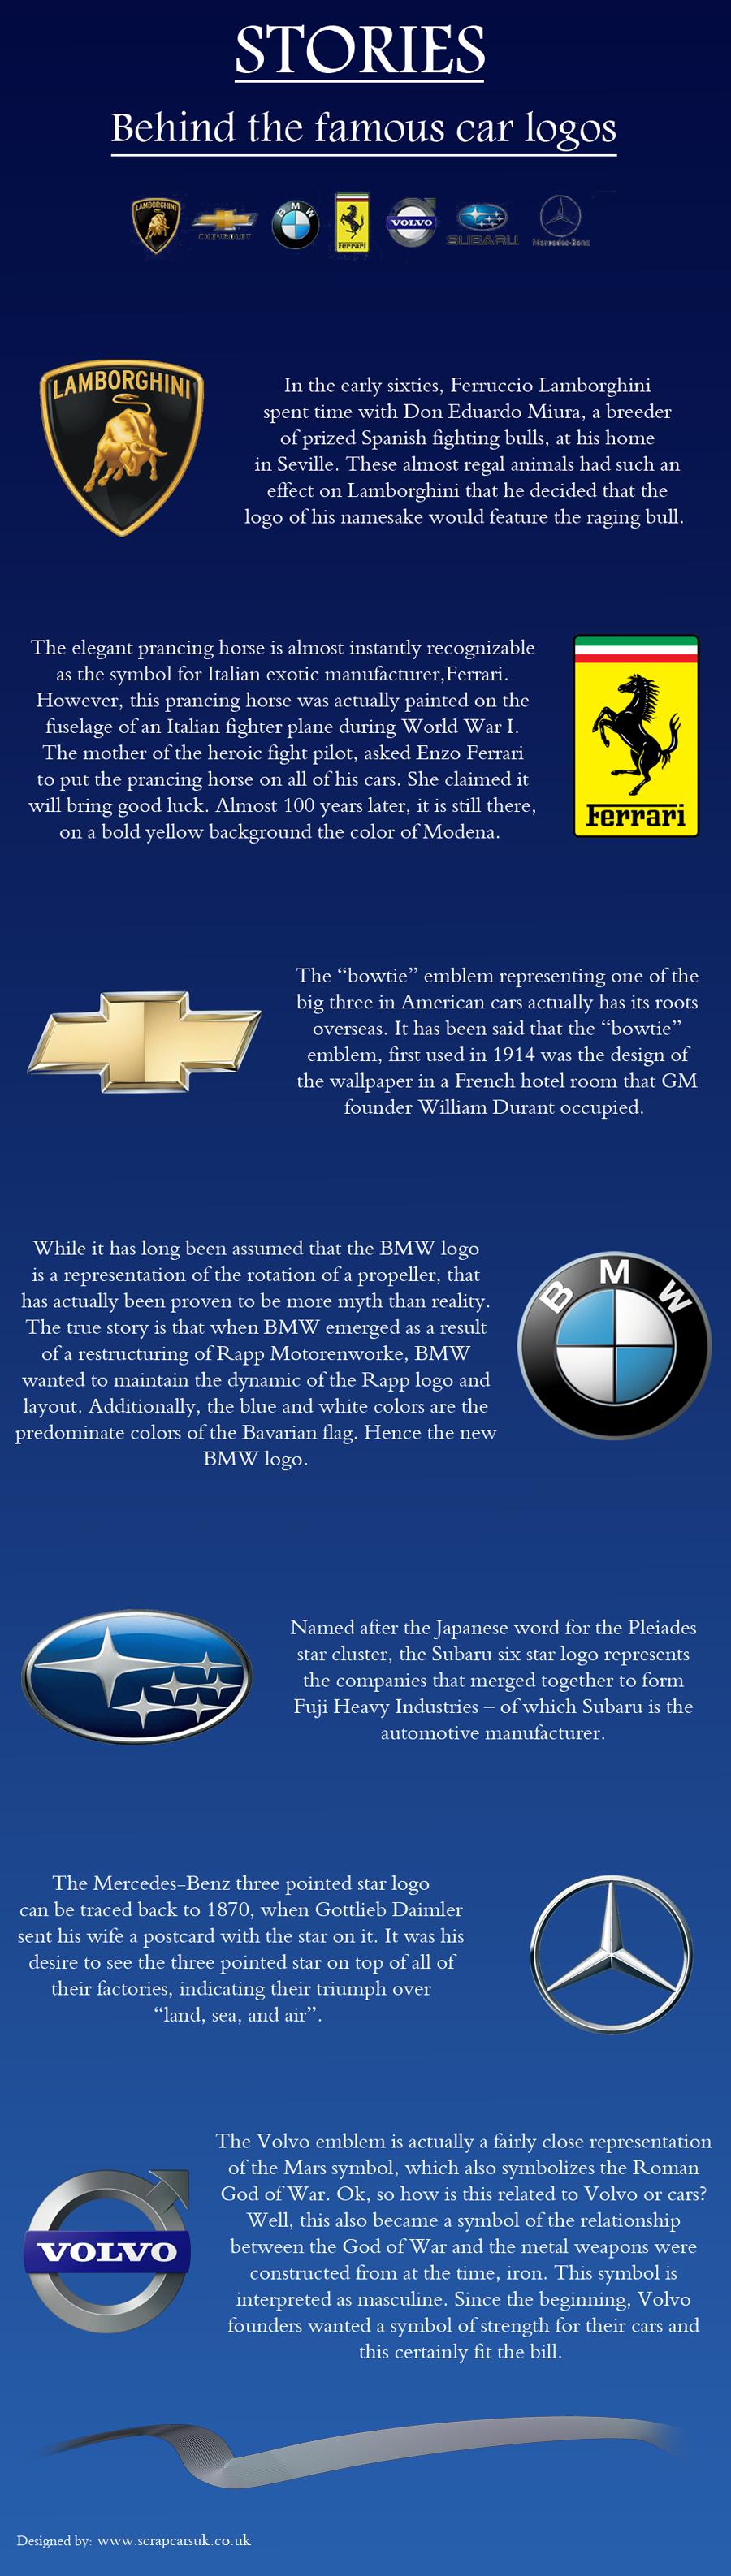 Historias detrás los logos de coches famosos #infografia #infographic #marketing